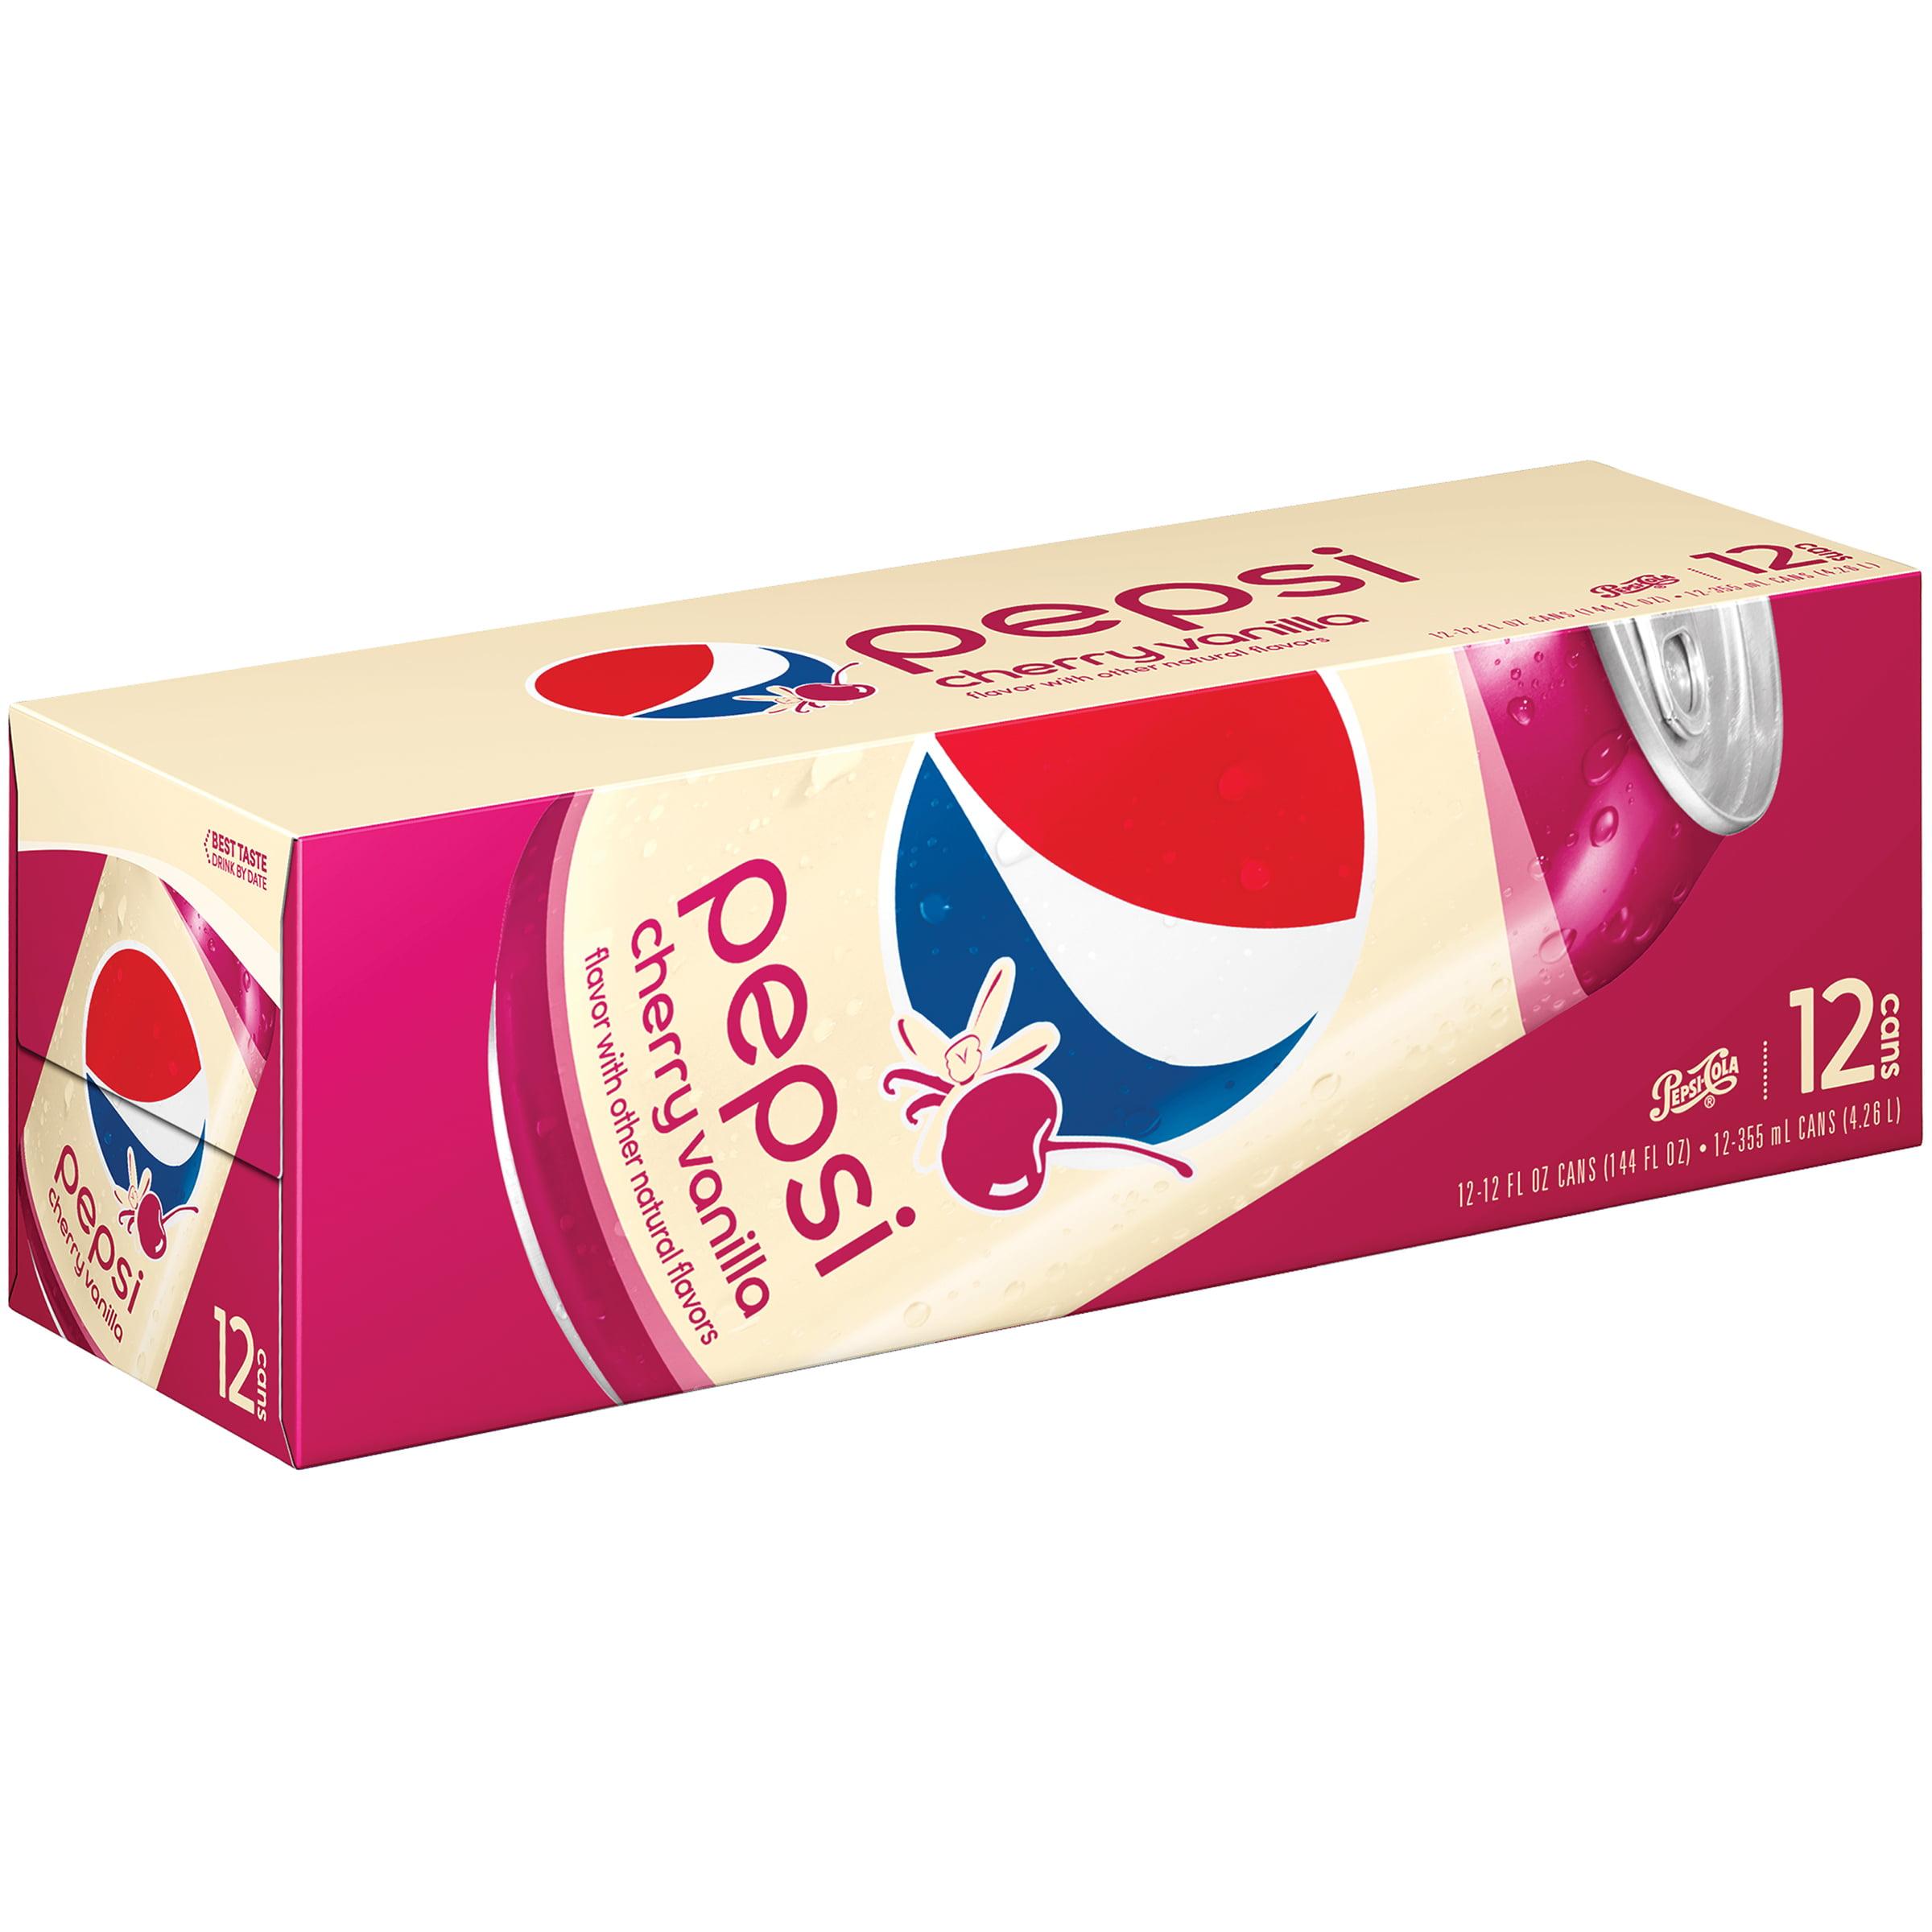 Pepsi-Cola® Pepsi Cherry Vanilla Soda, 12 Count, 12 fl. oz. Cans